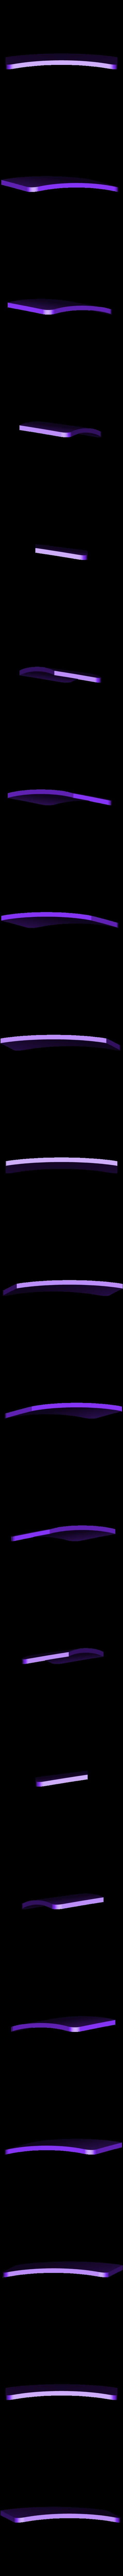 access_panel_bracket.stl Download free STL file Speedy Red Midi Wing • Design to 3D print, wersy